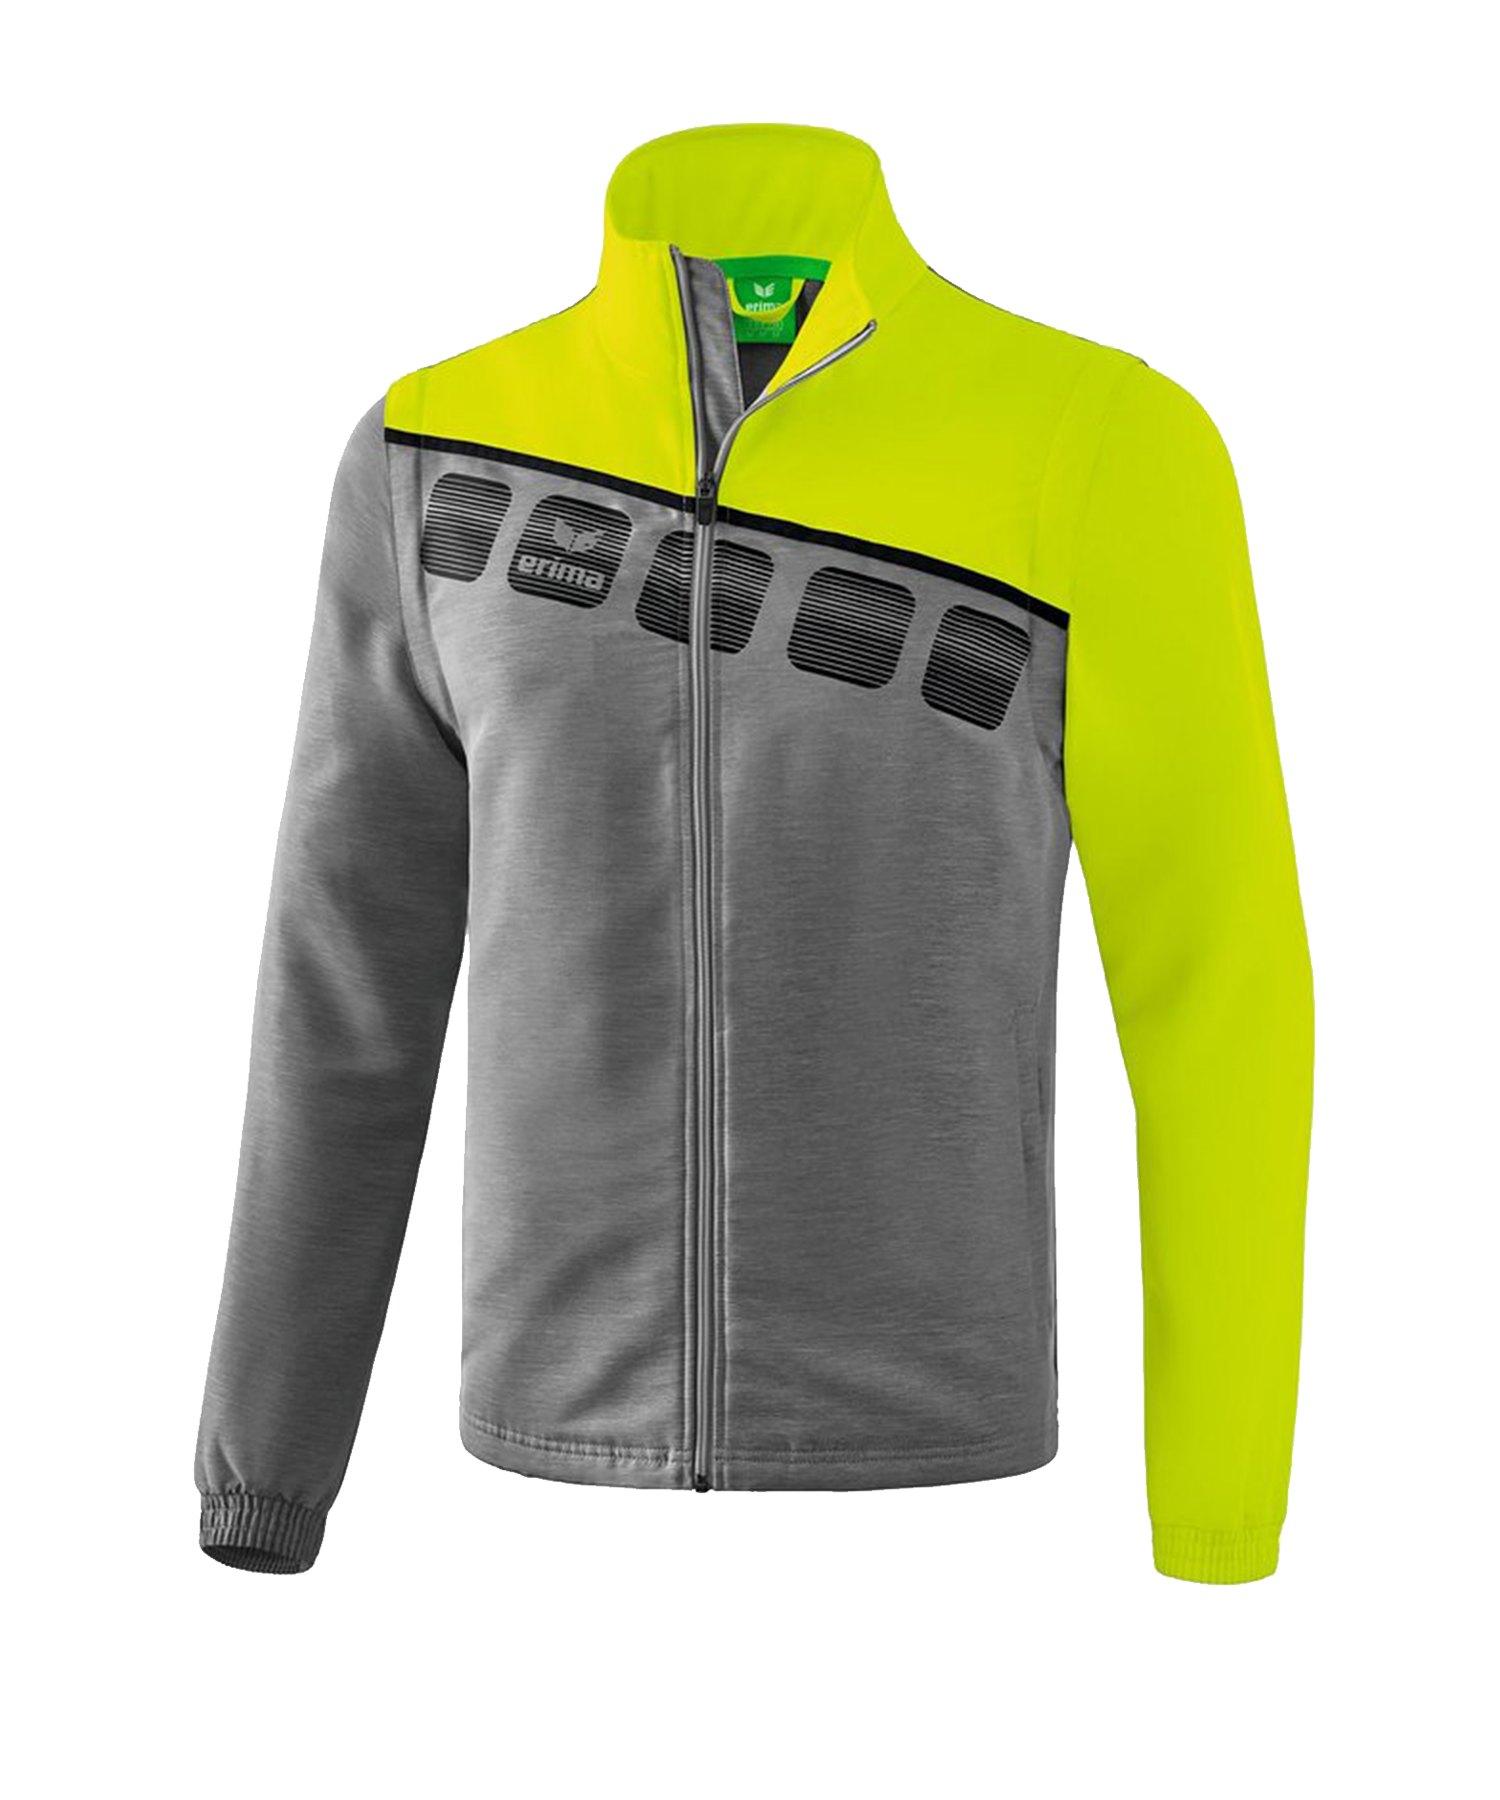 Erima 5-C Jacke mit abnehmbaren Ärmeln Grau Grün - Grau